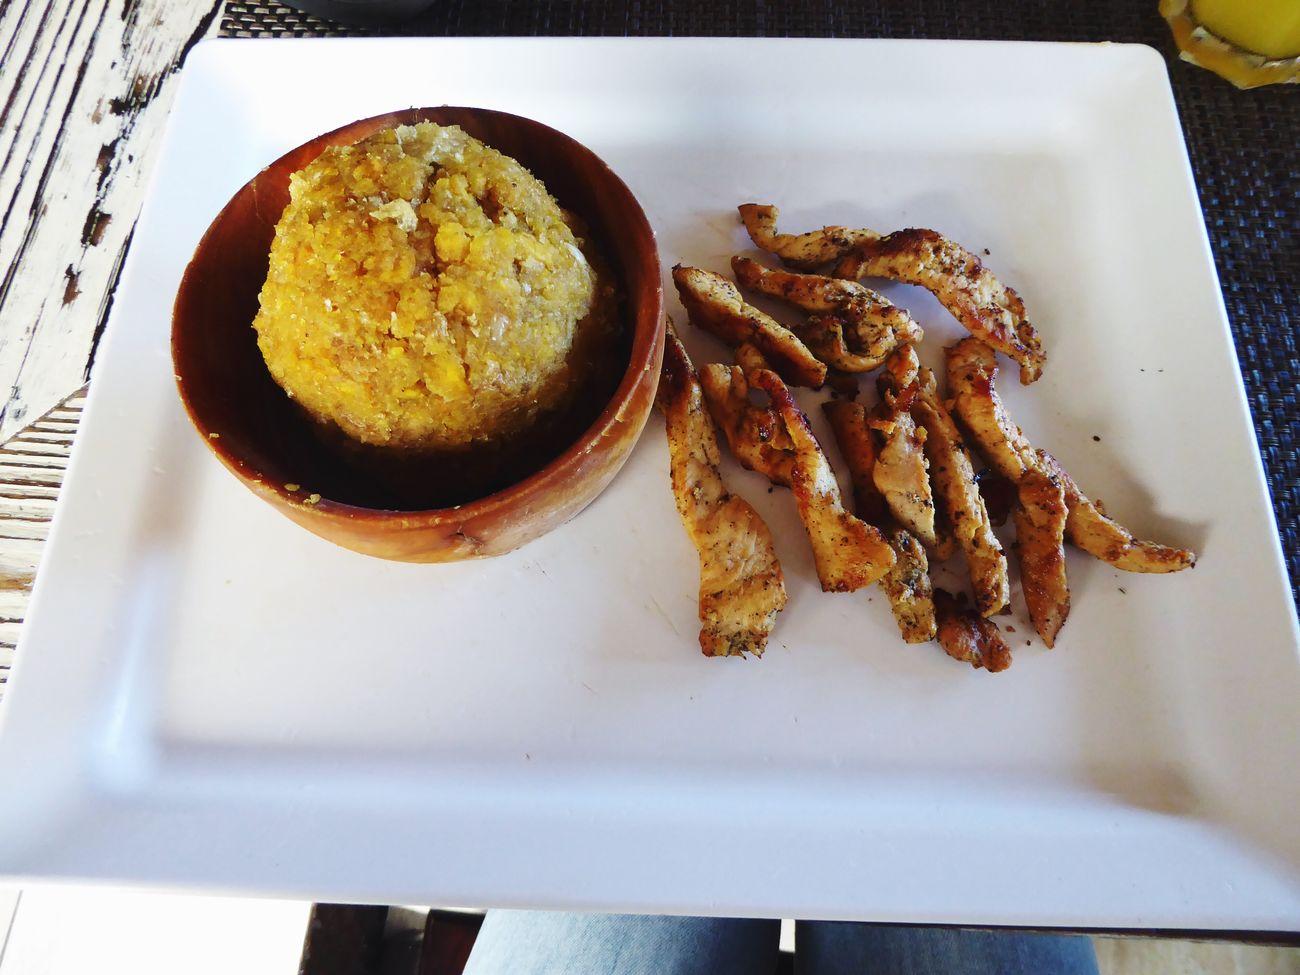 Mofongo Food Foodporn Caribbean Life Chickens Yummy